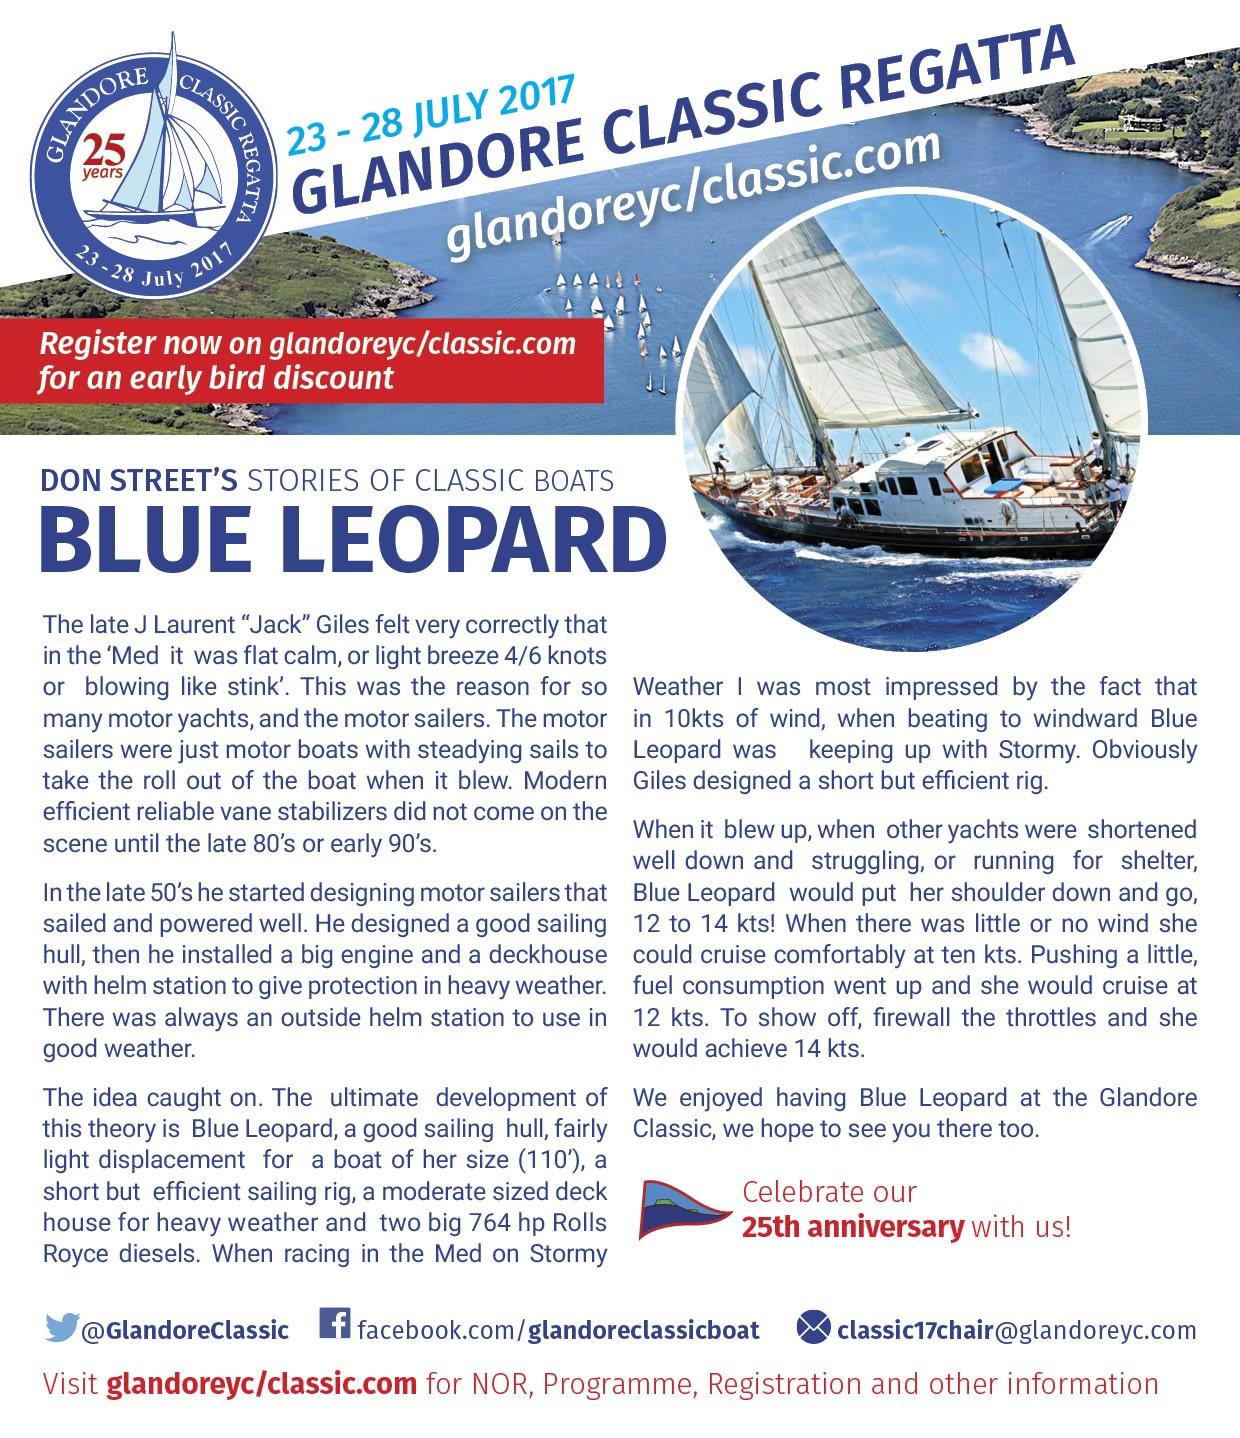 GCR2017-DonStreet-BlueLeopard-3